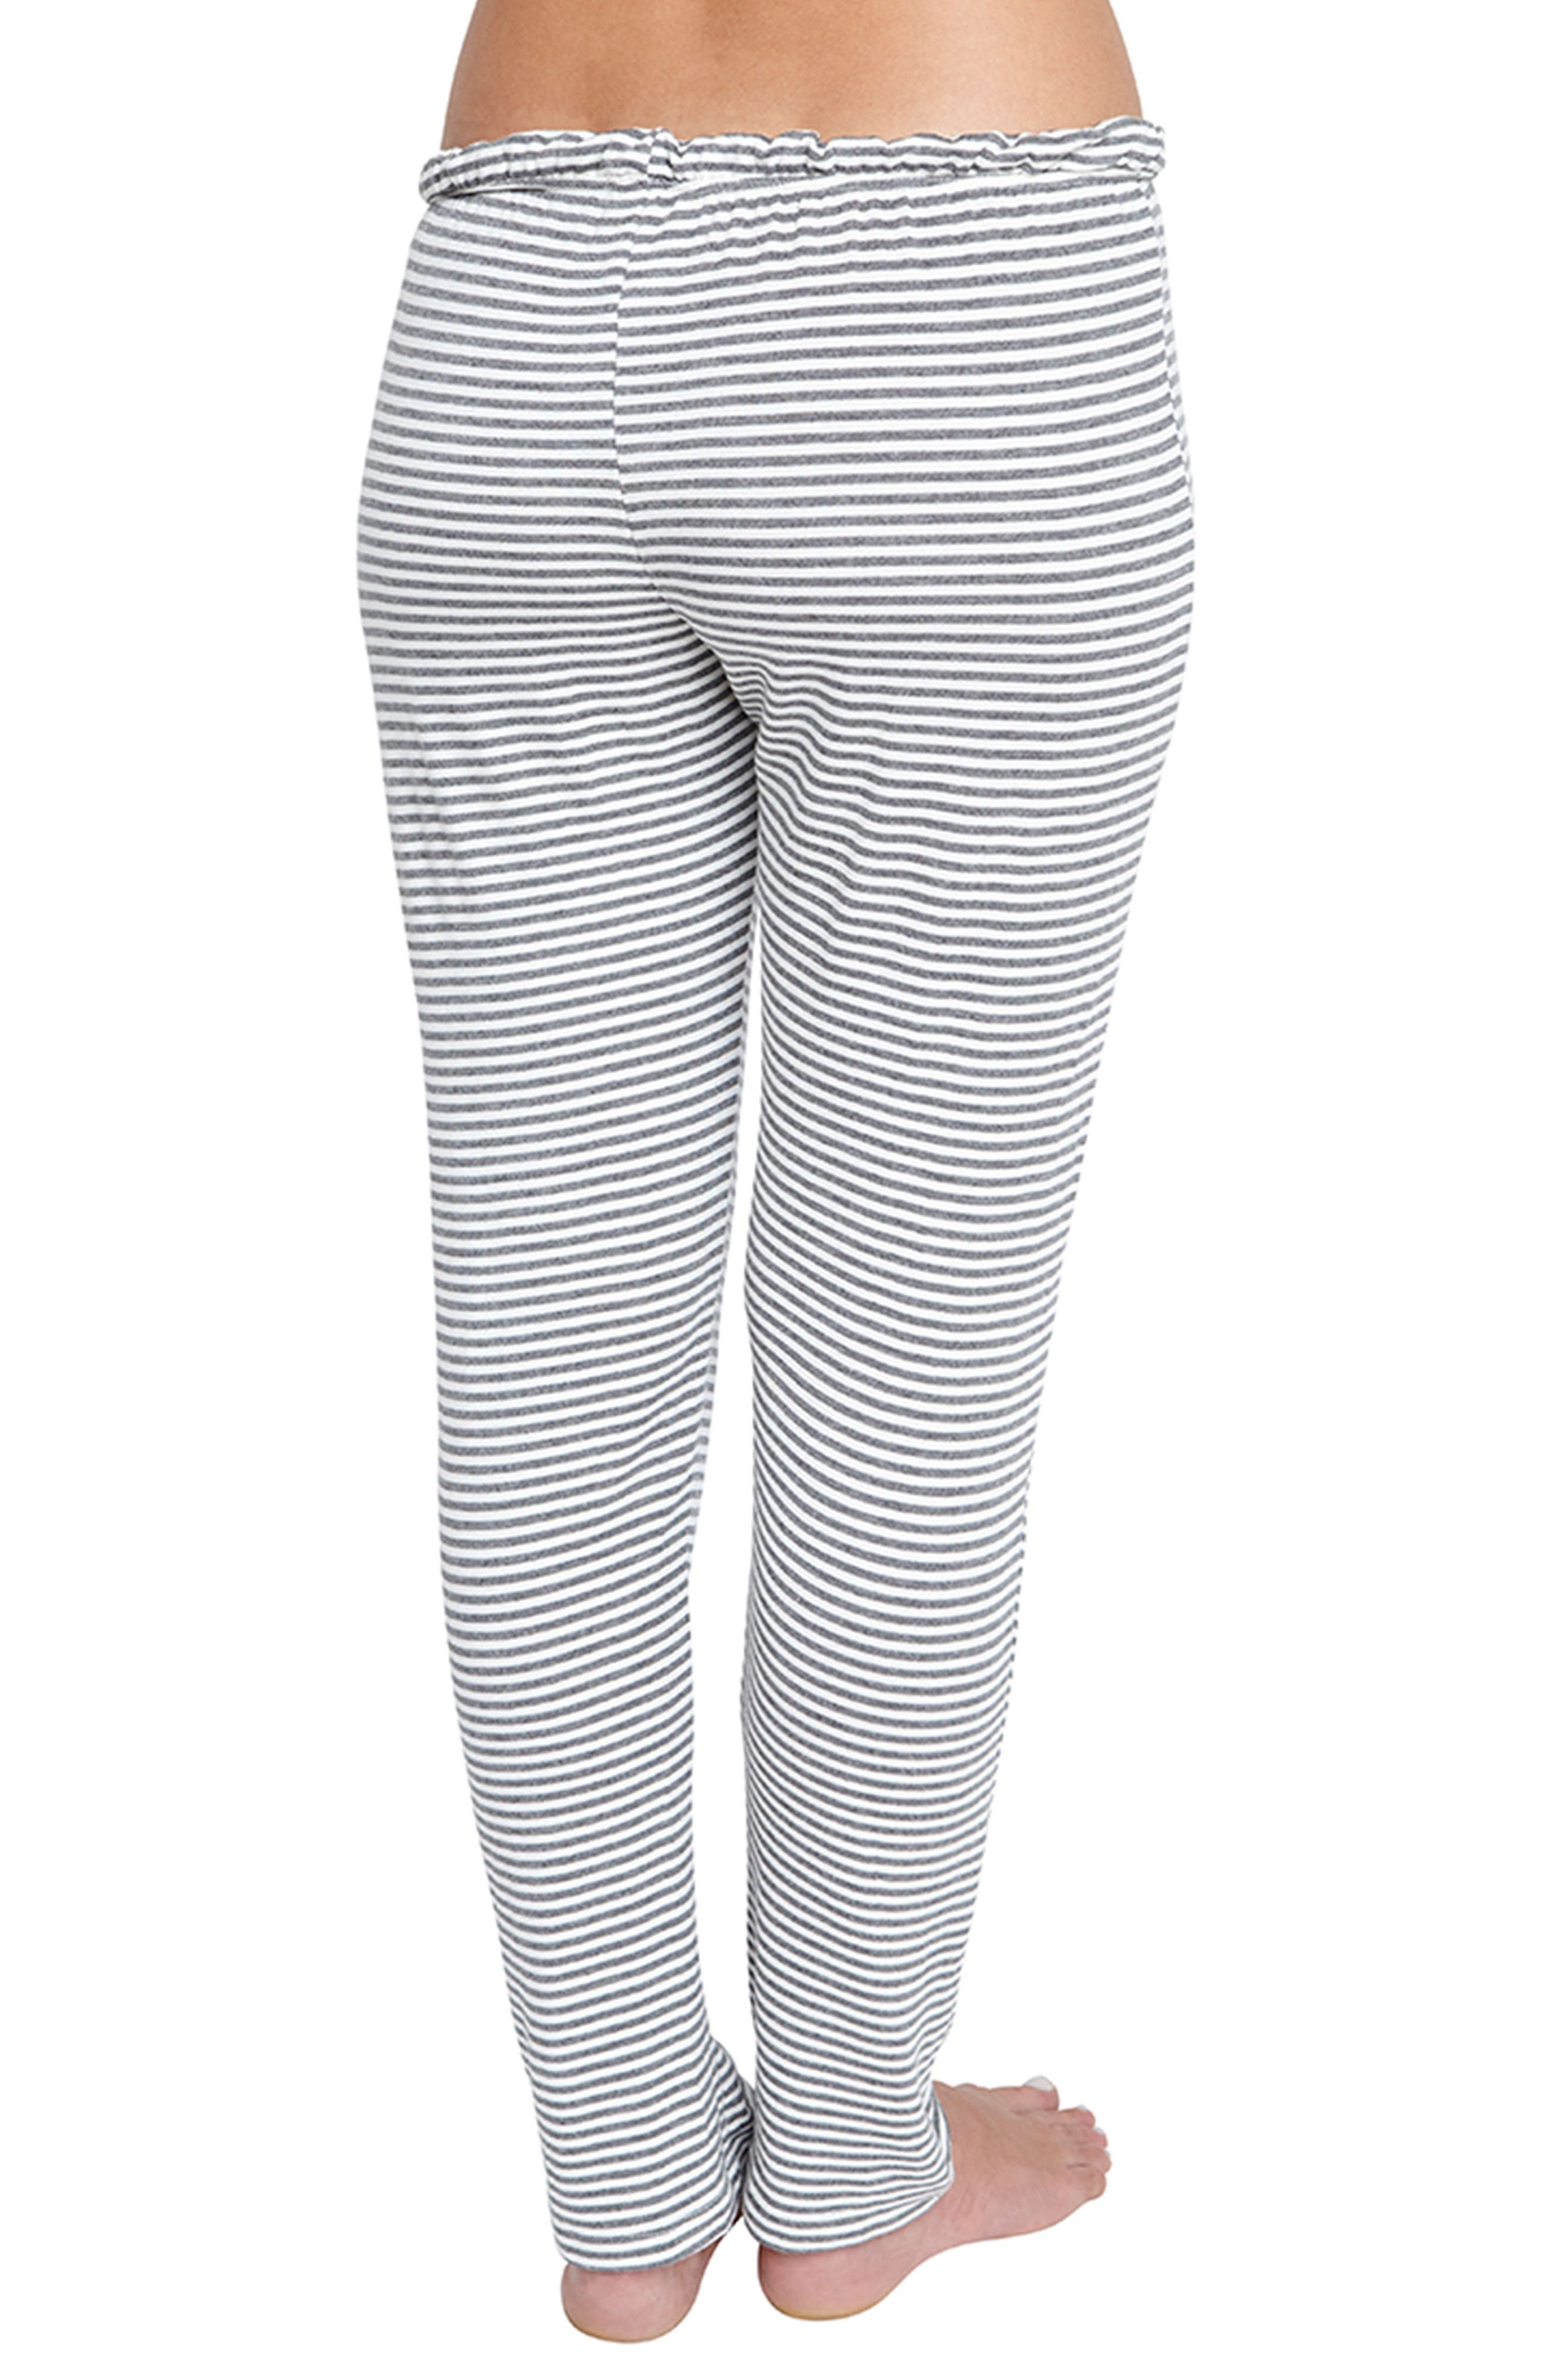 Sadie Stripes Pajama Pants,                             Alternate thumbnail 2, color,